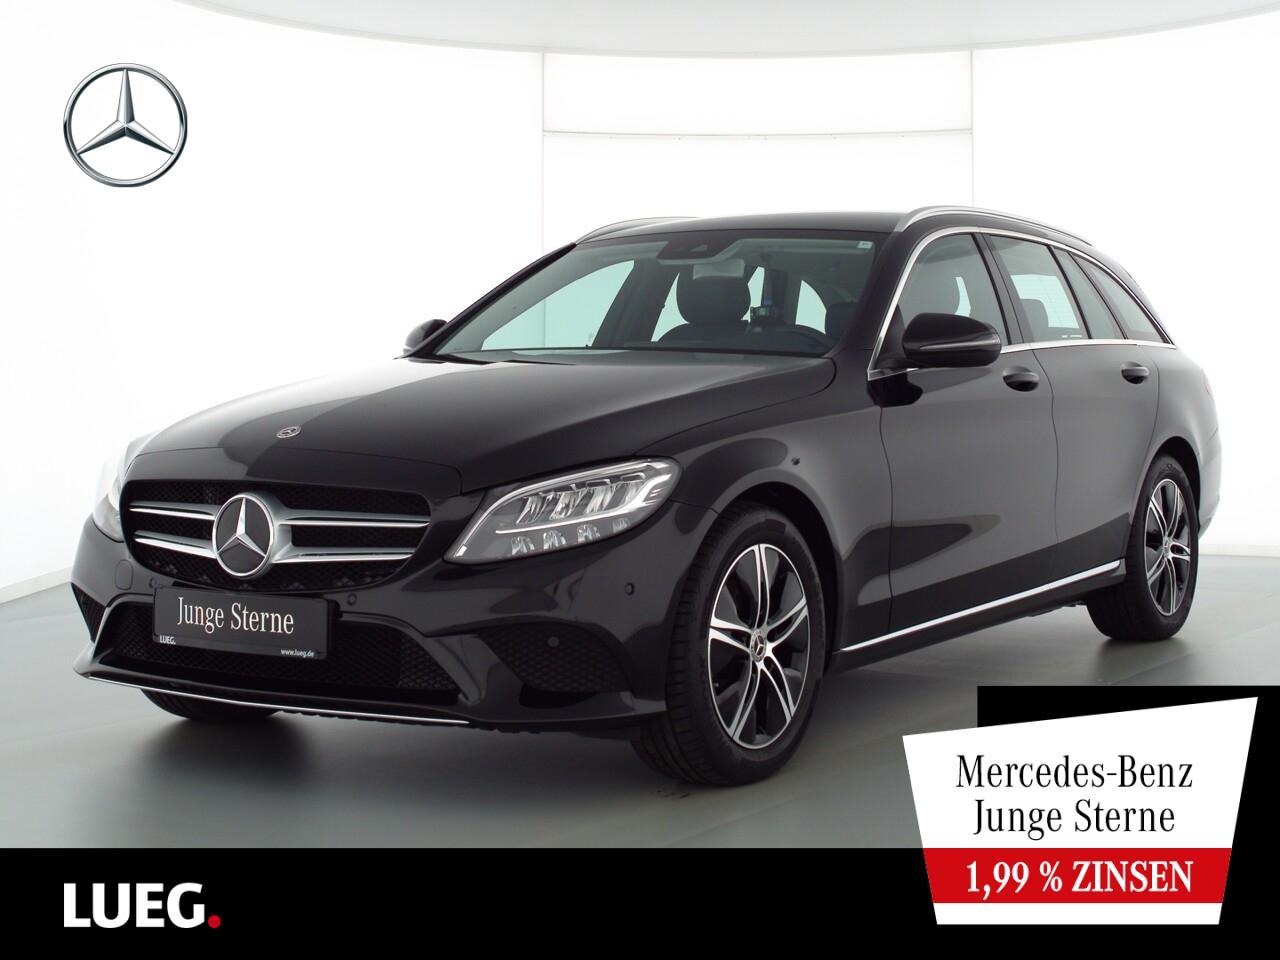 Mercedes-Benz C 180 T Avantgarde+Navi+LED-HP+eHeck+CarP+ParkPl, Jahr 2020, Benzin